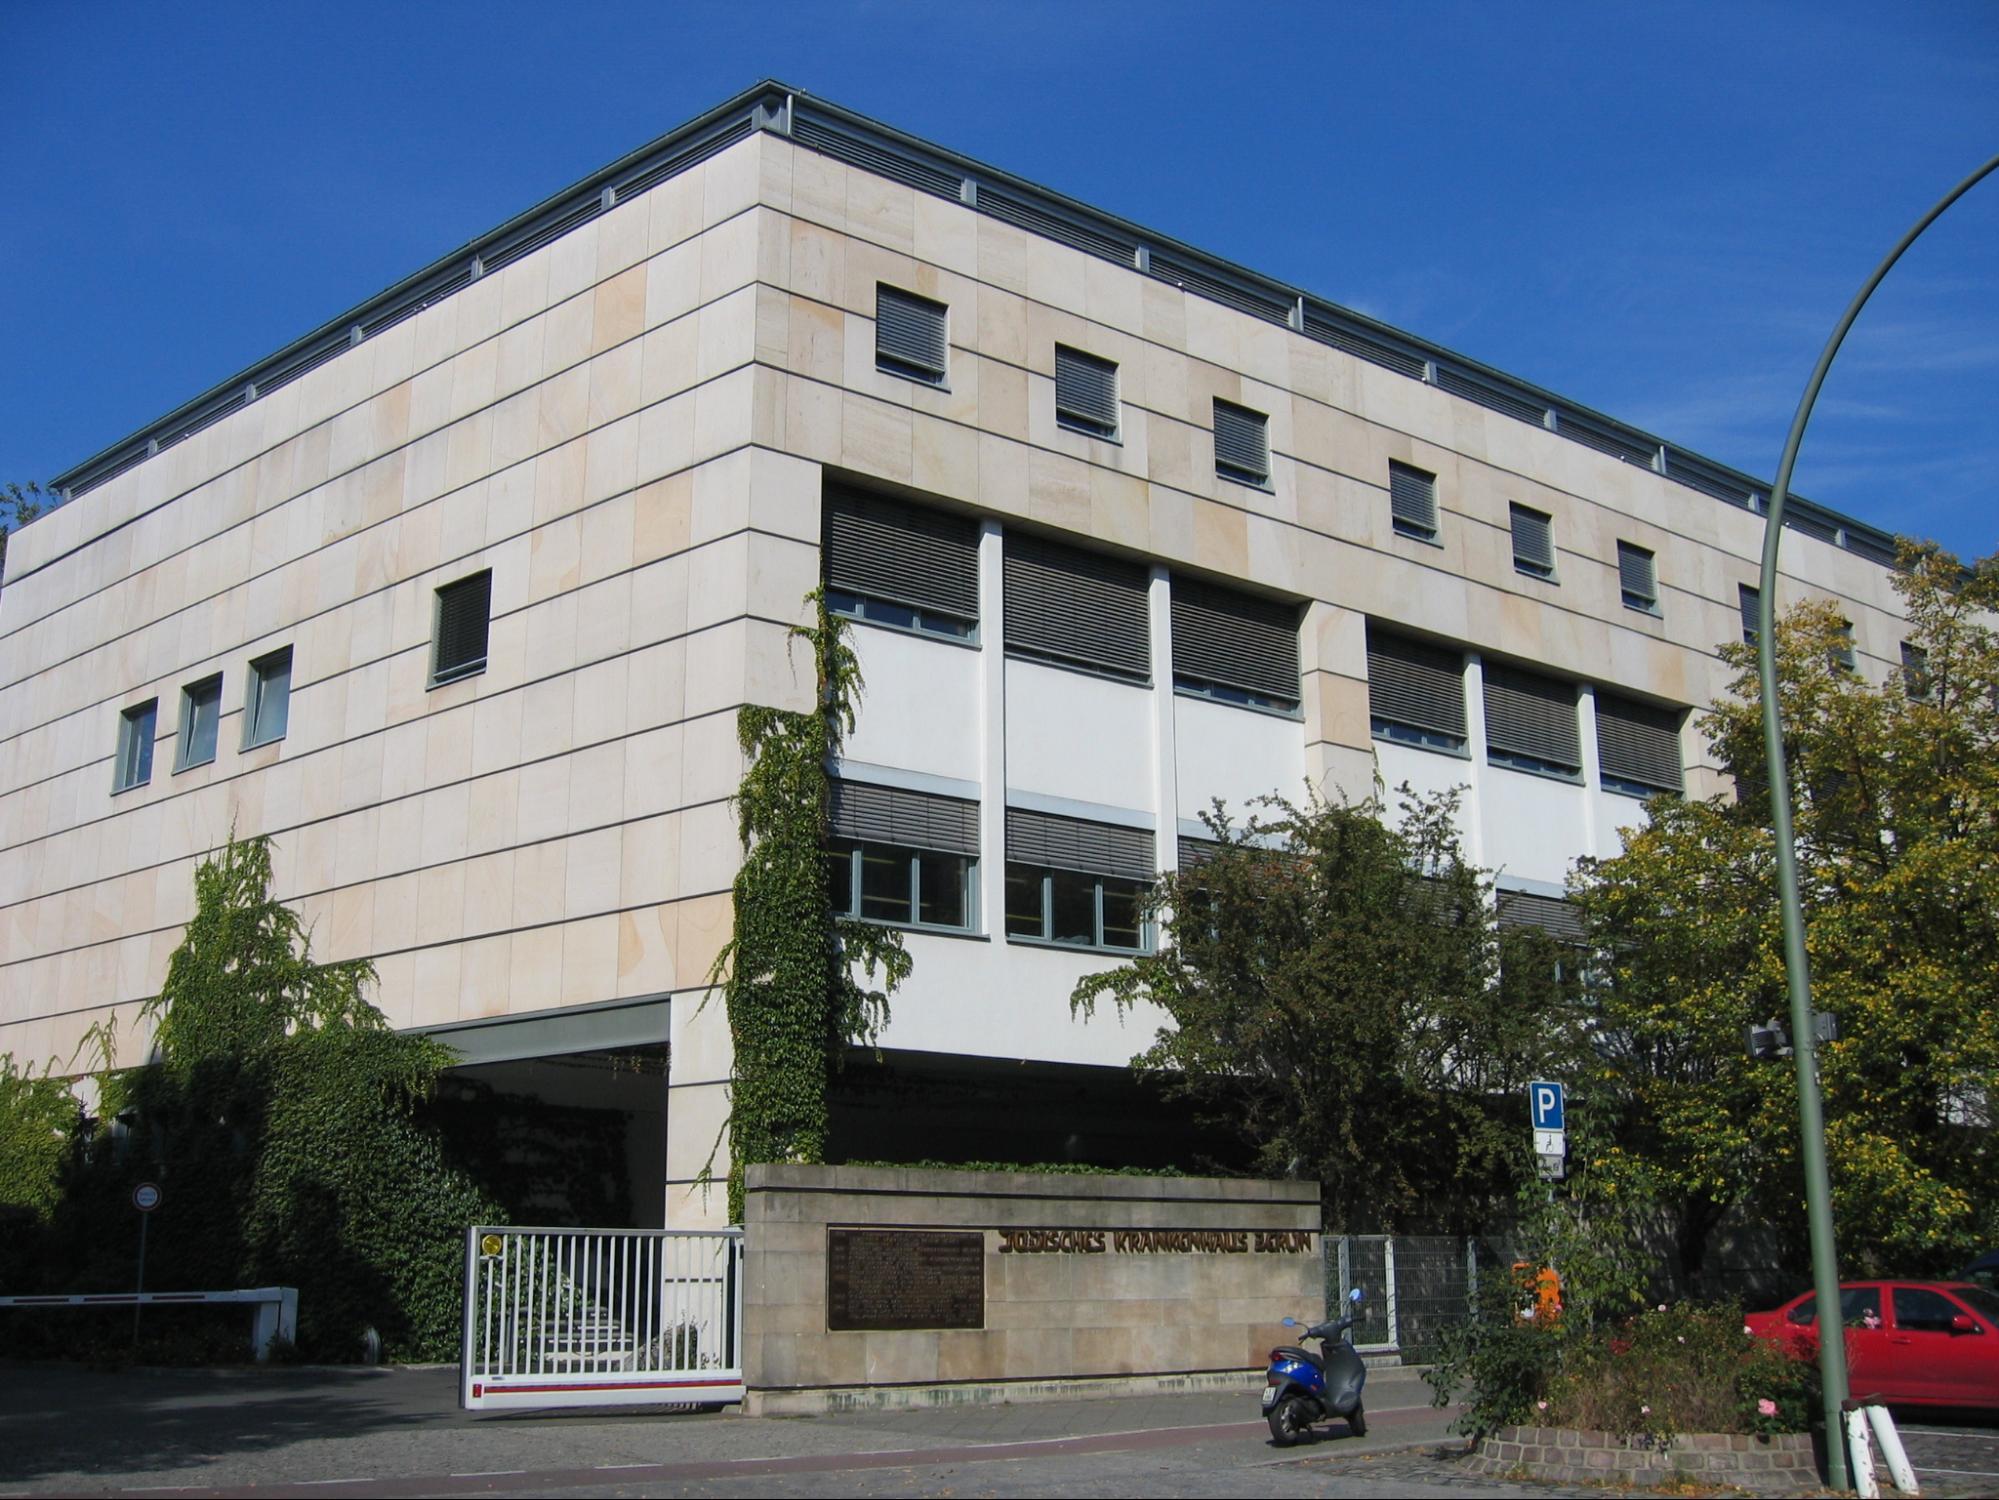 Jüdisches Krankenhaus Berlin. Фото: Wikipedia